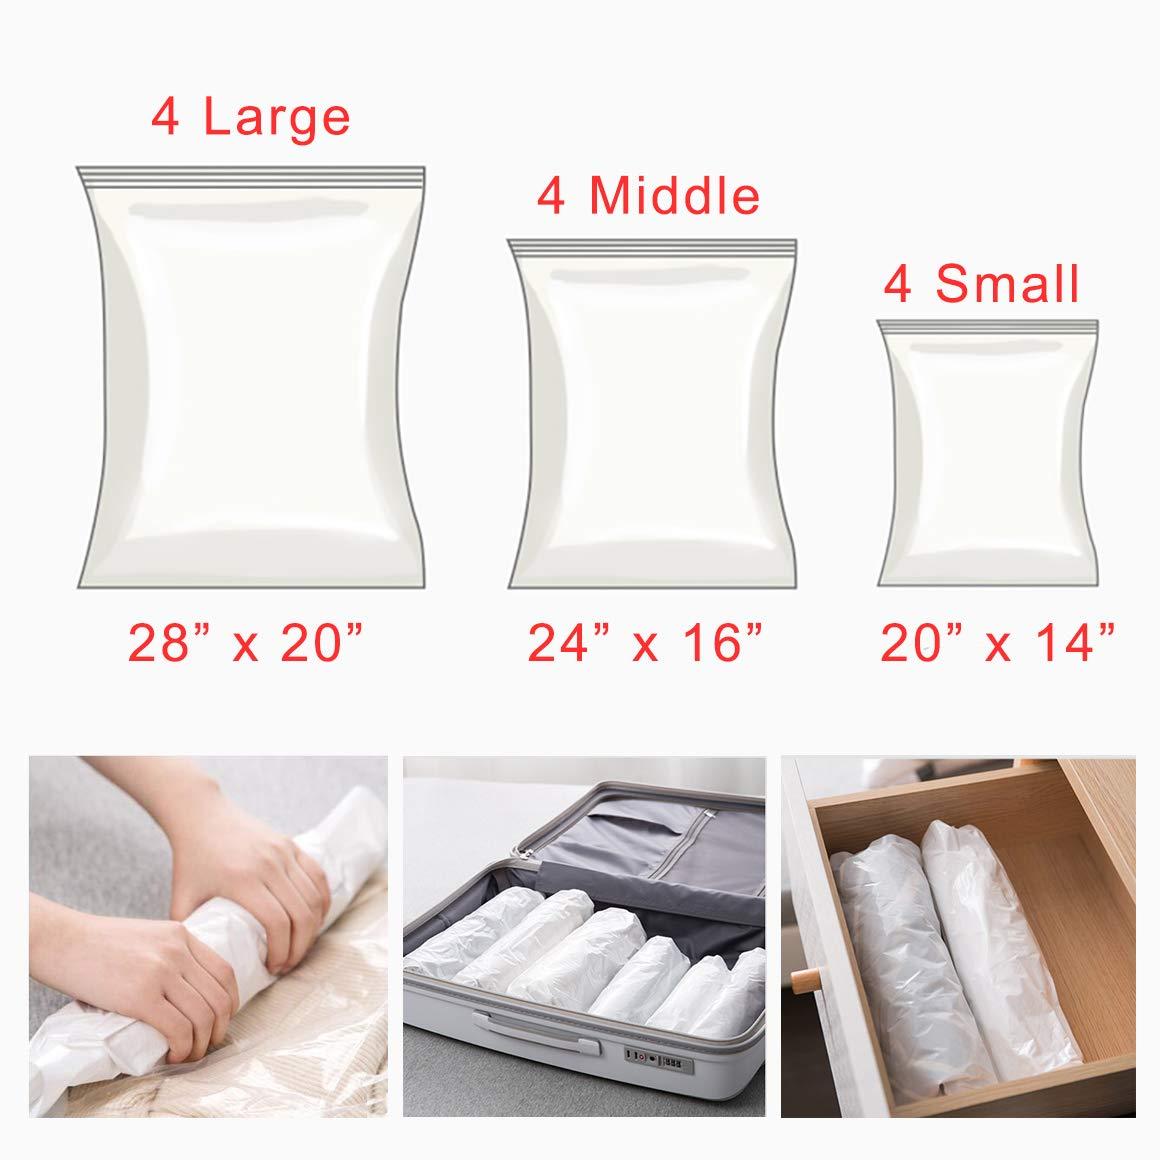 UrsoKuz Space Saver Storage Bags, Airtight Travel Storage Rolling Compression Bags, No Vacuum Ziploc Sacks, for Clothes Pillow Towels Saving, 12 Pack(Small, Medium, Large)